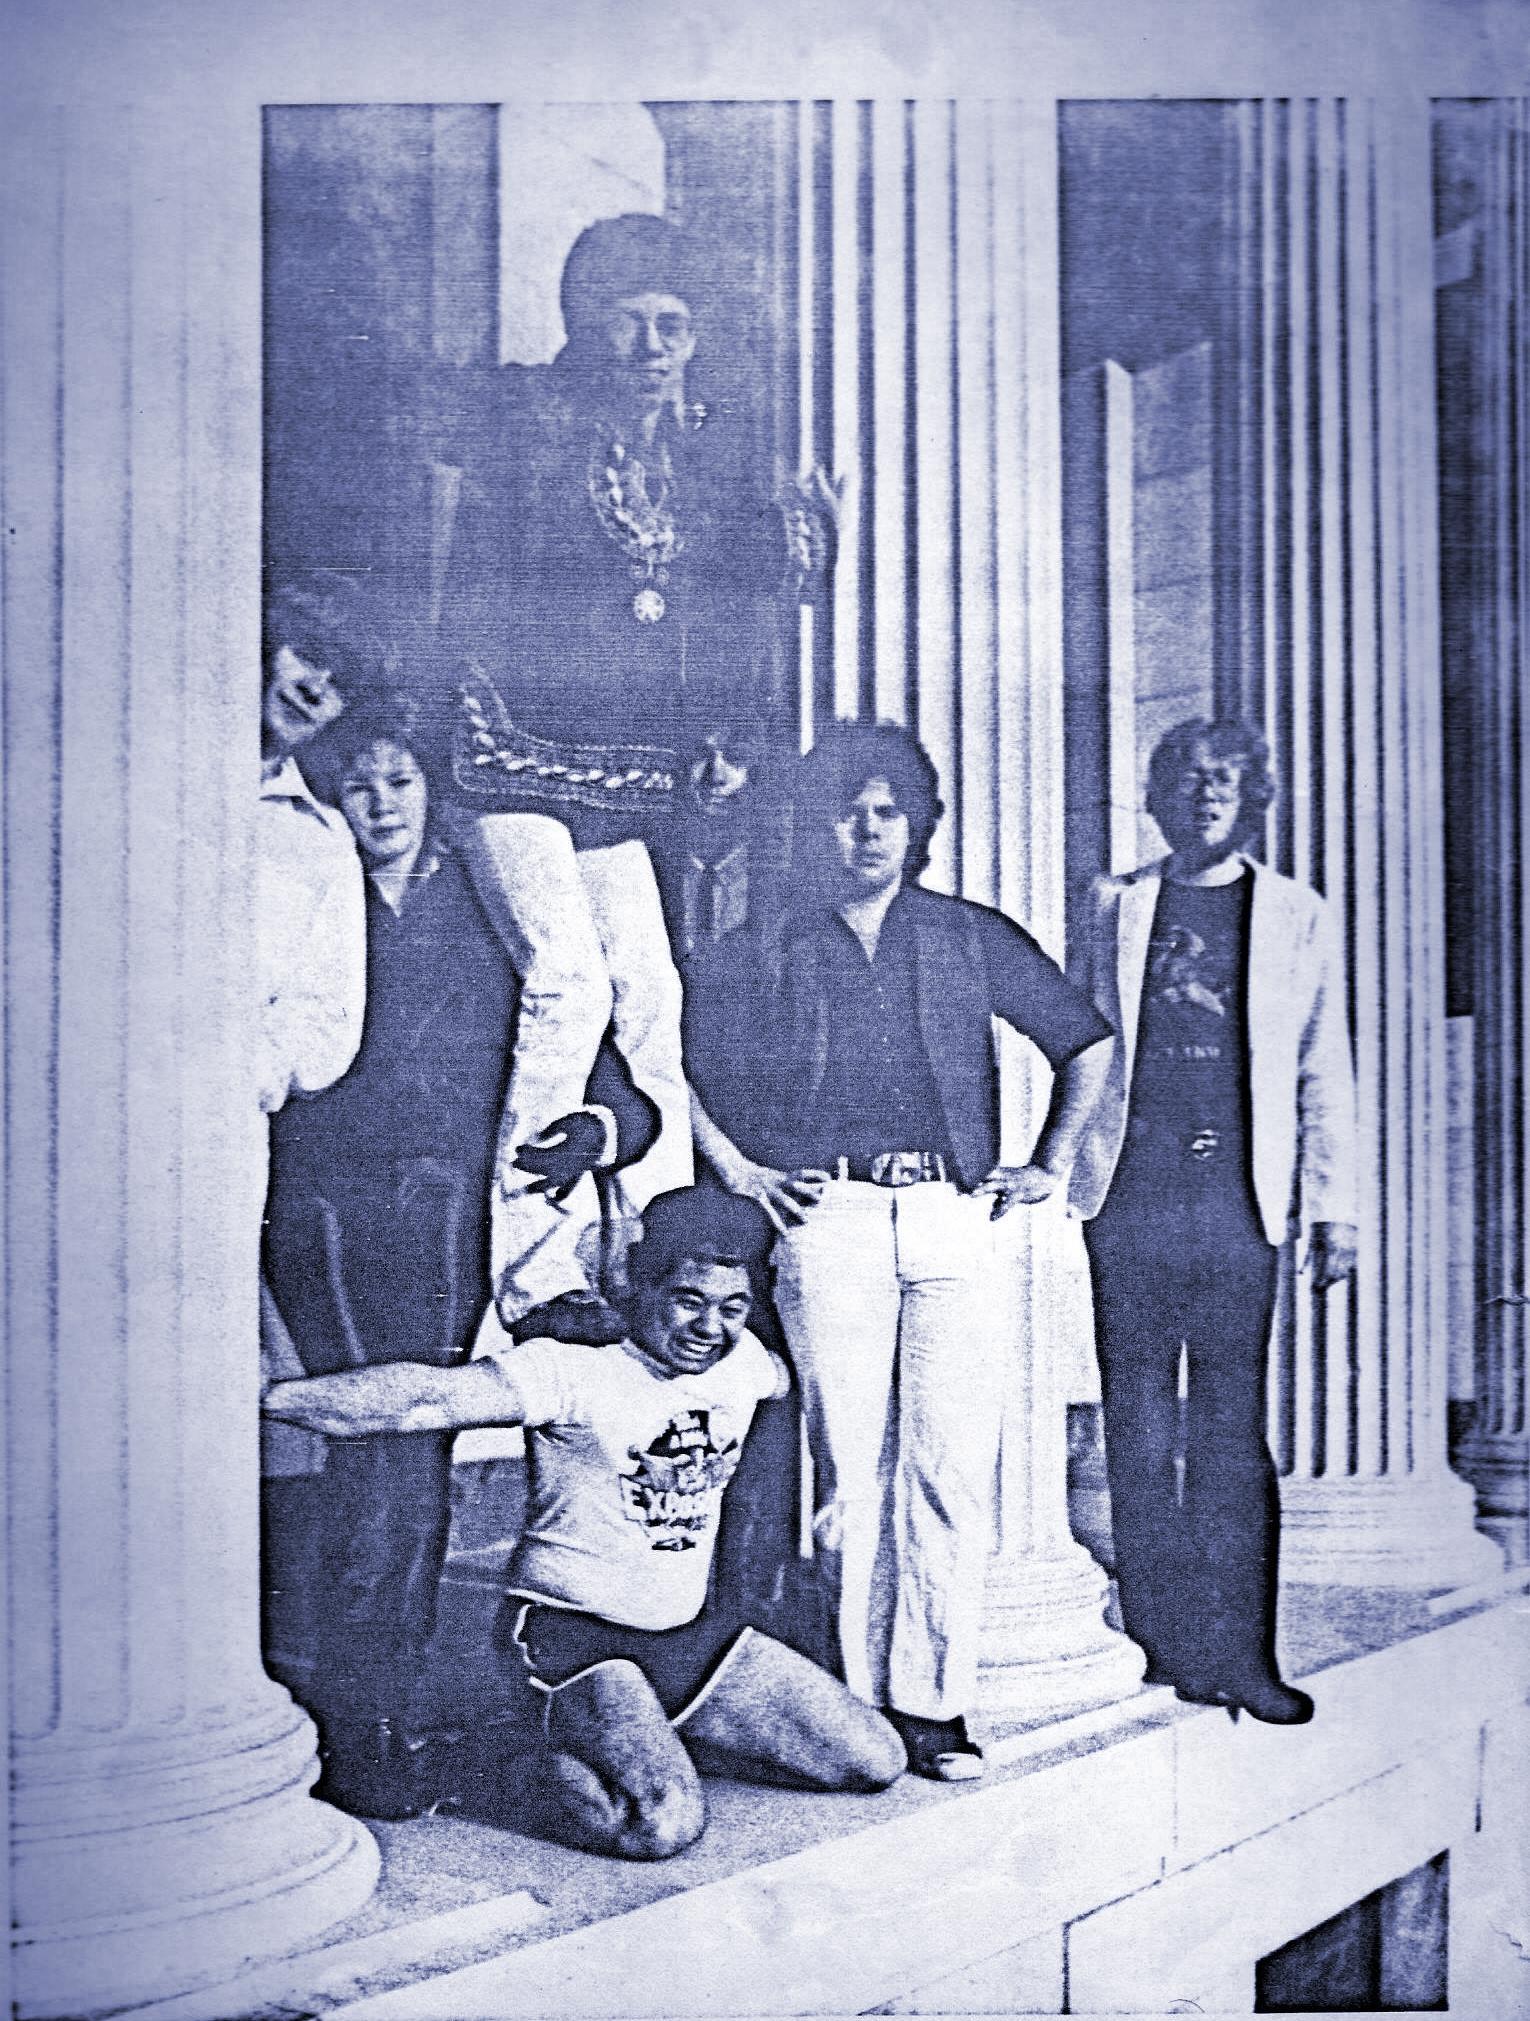 Buffalo Buffalo 'Fab 7' flyer Elmwood ave Art Gallery 05.04.1980 (3)